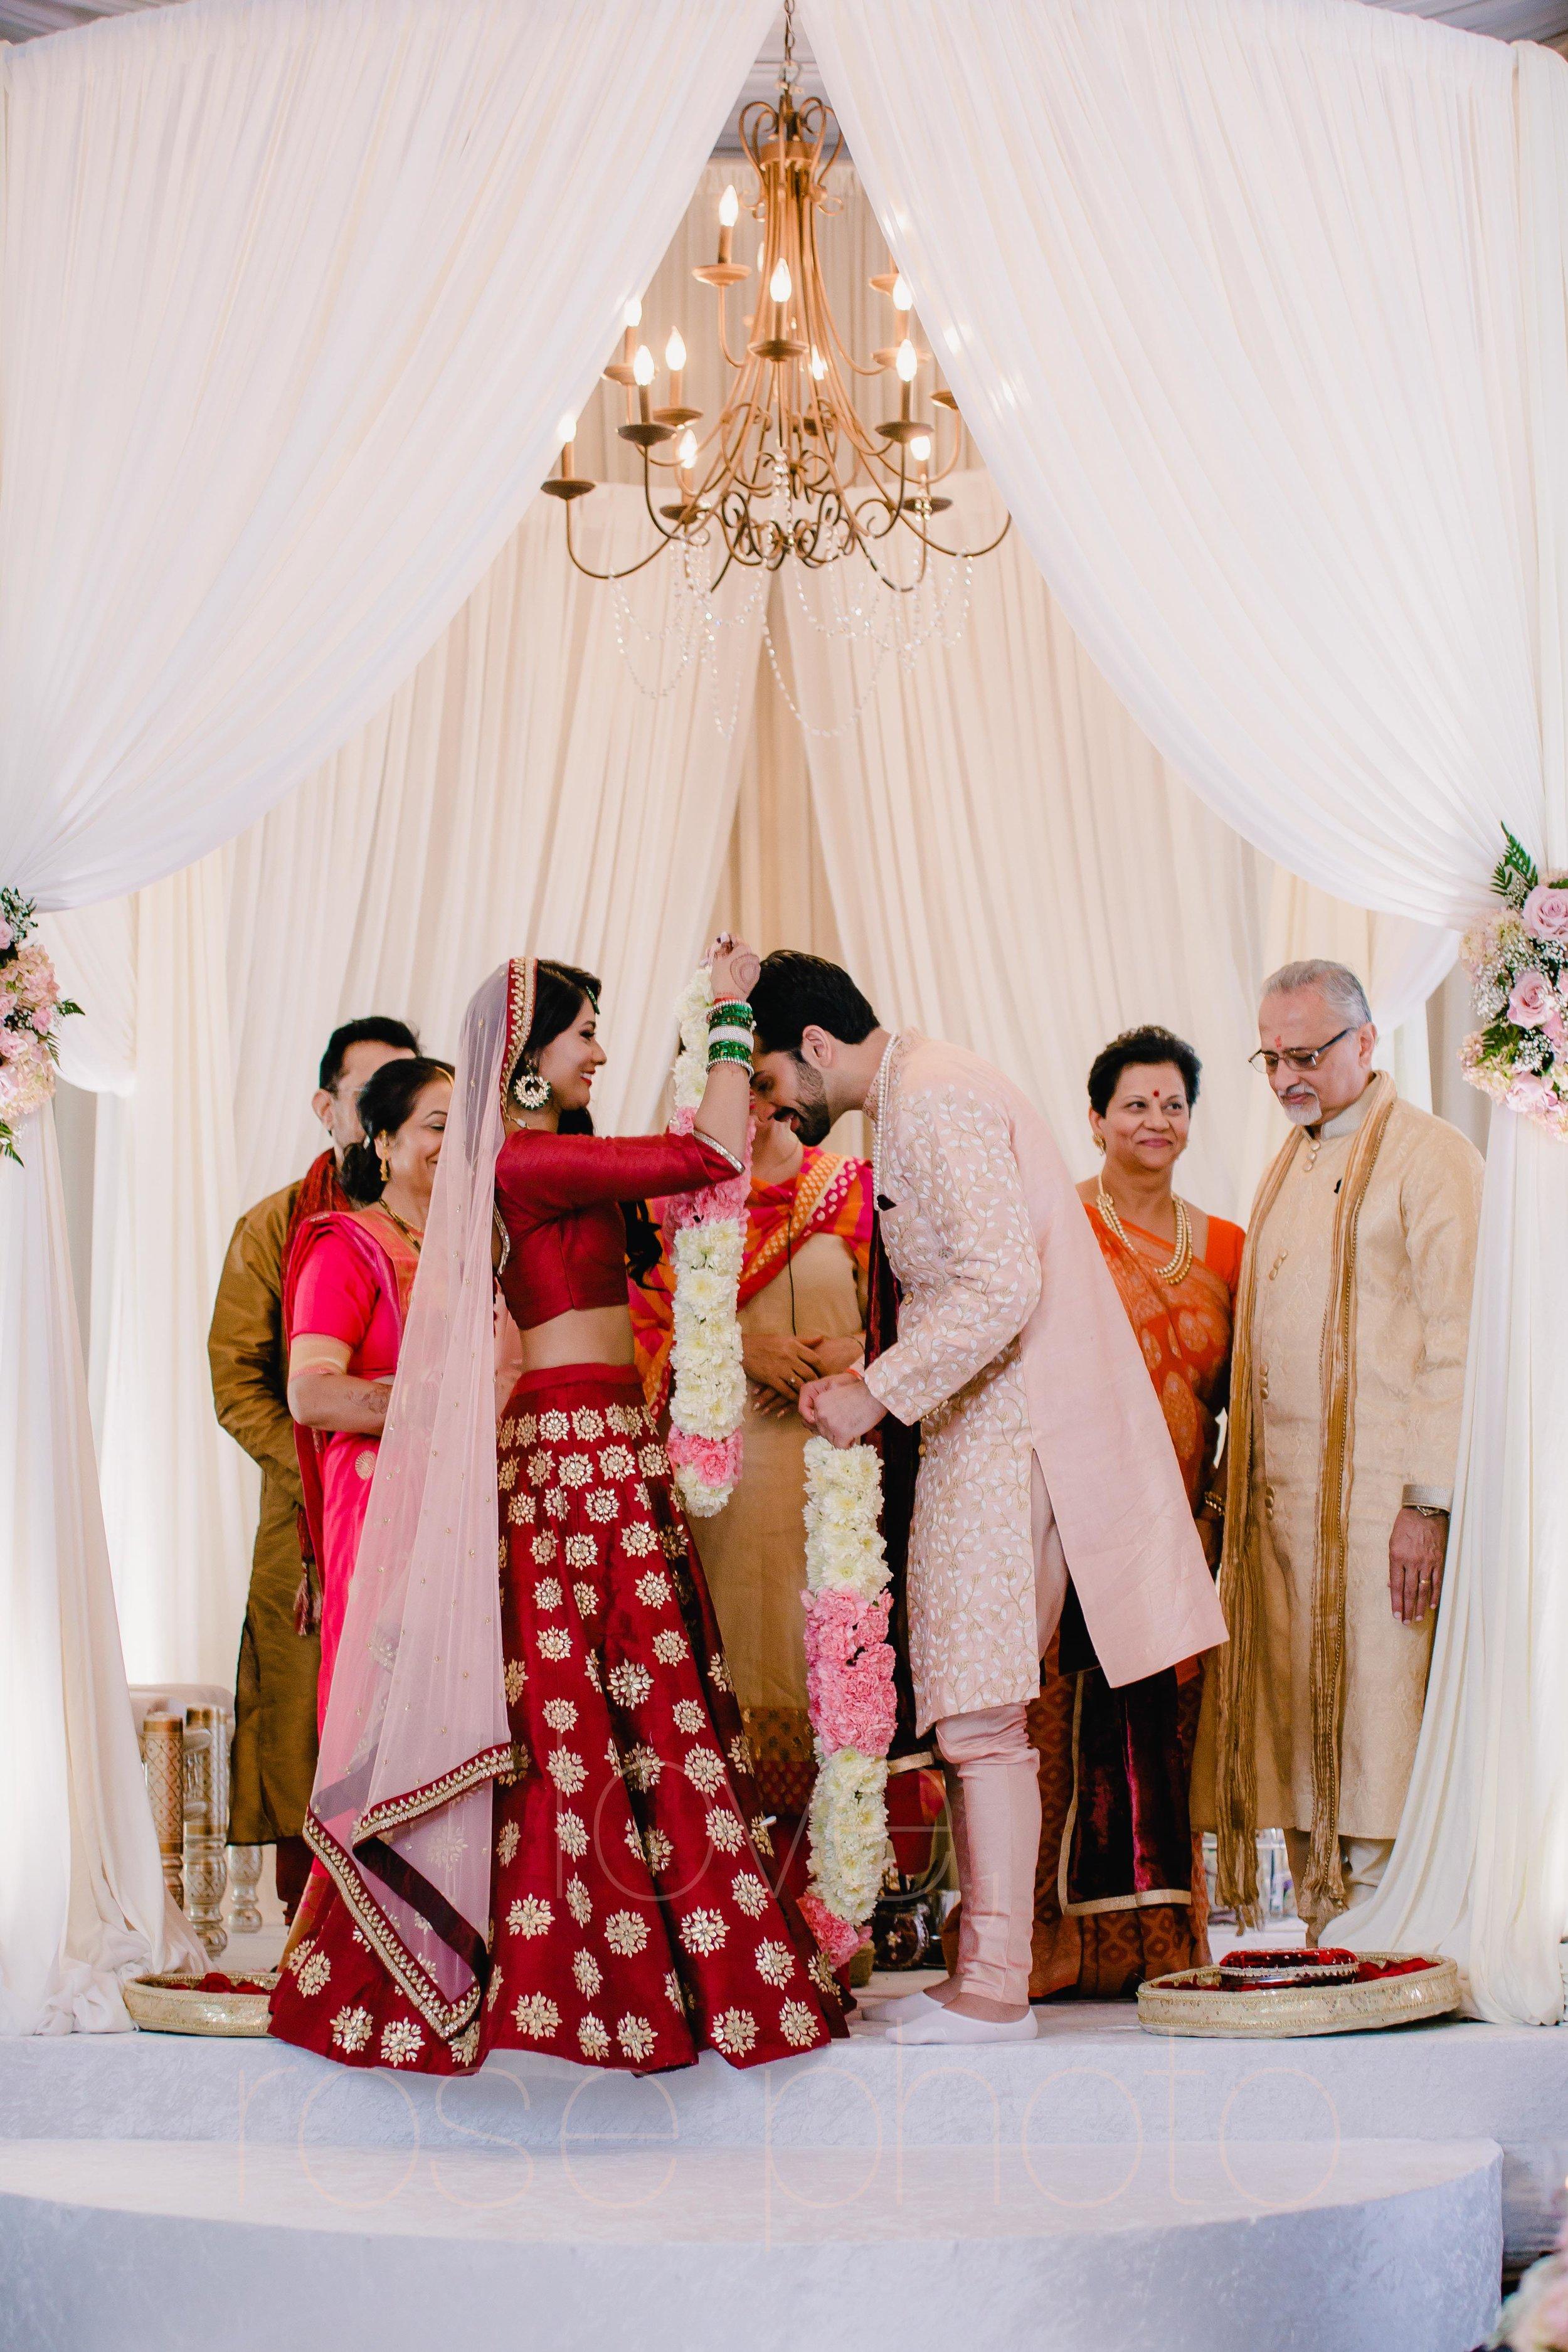 Chicago Indian Wedding best photography lifestyle wedding portrait luxury wedding-34.jpg